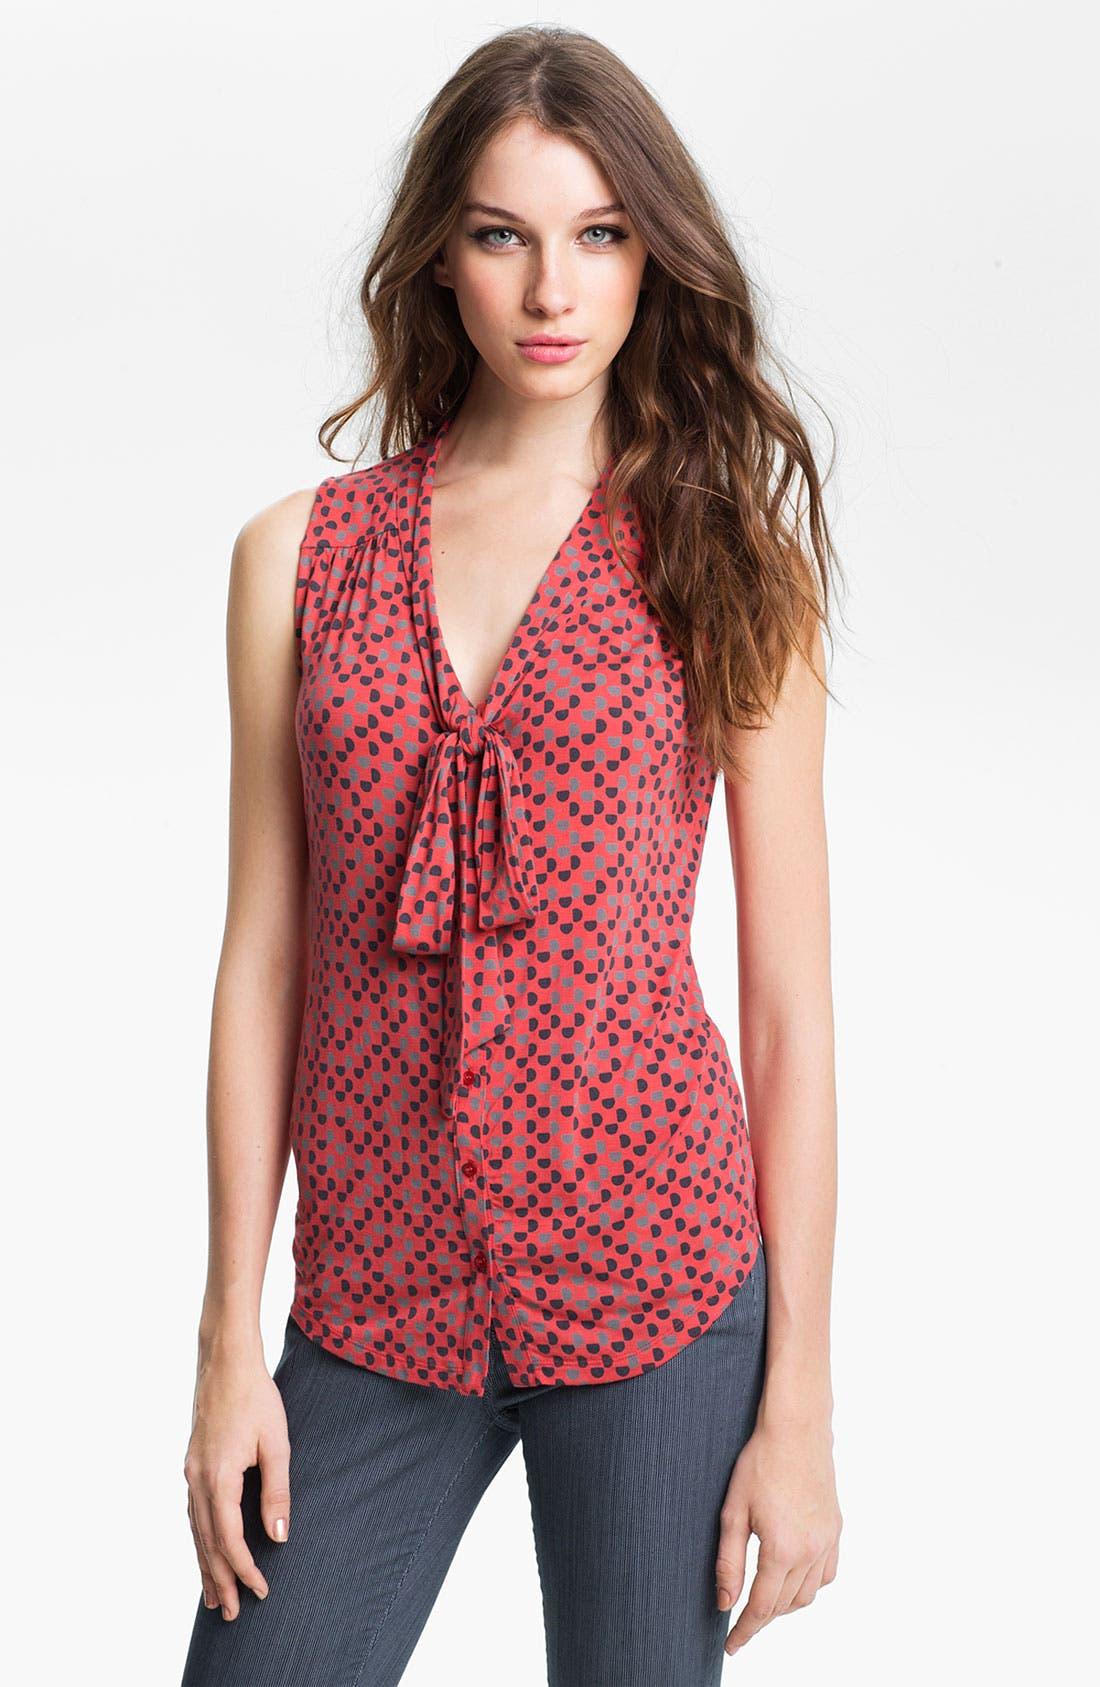 Main Image - Halogen Tie Neck Sleeveless Knit Top (Petite)